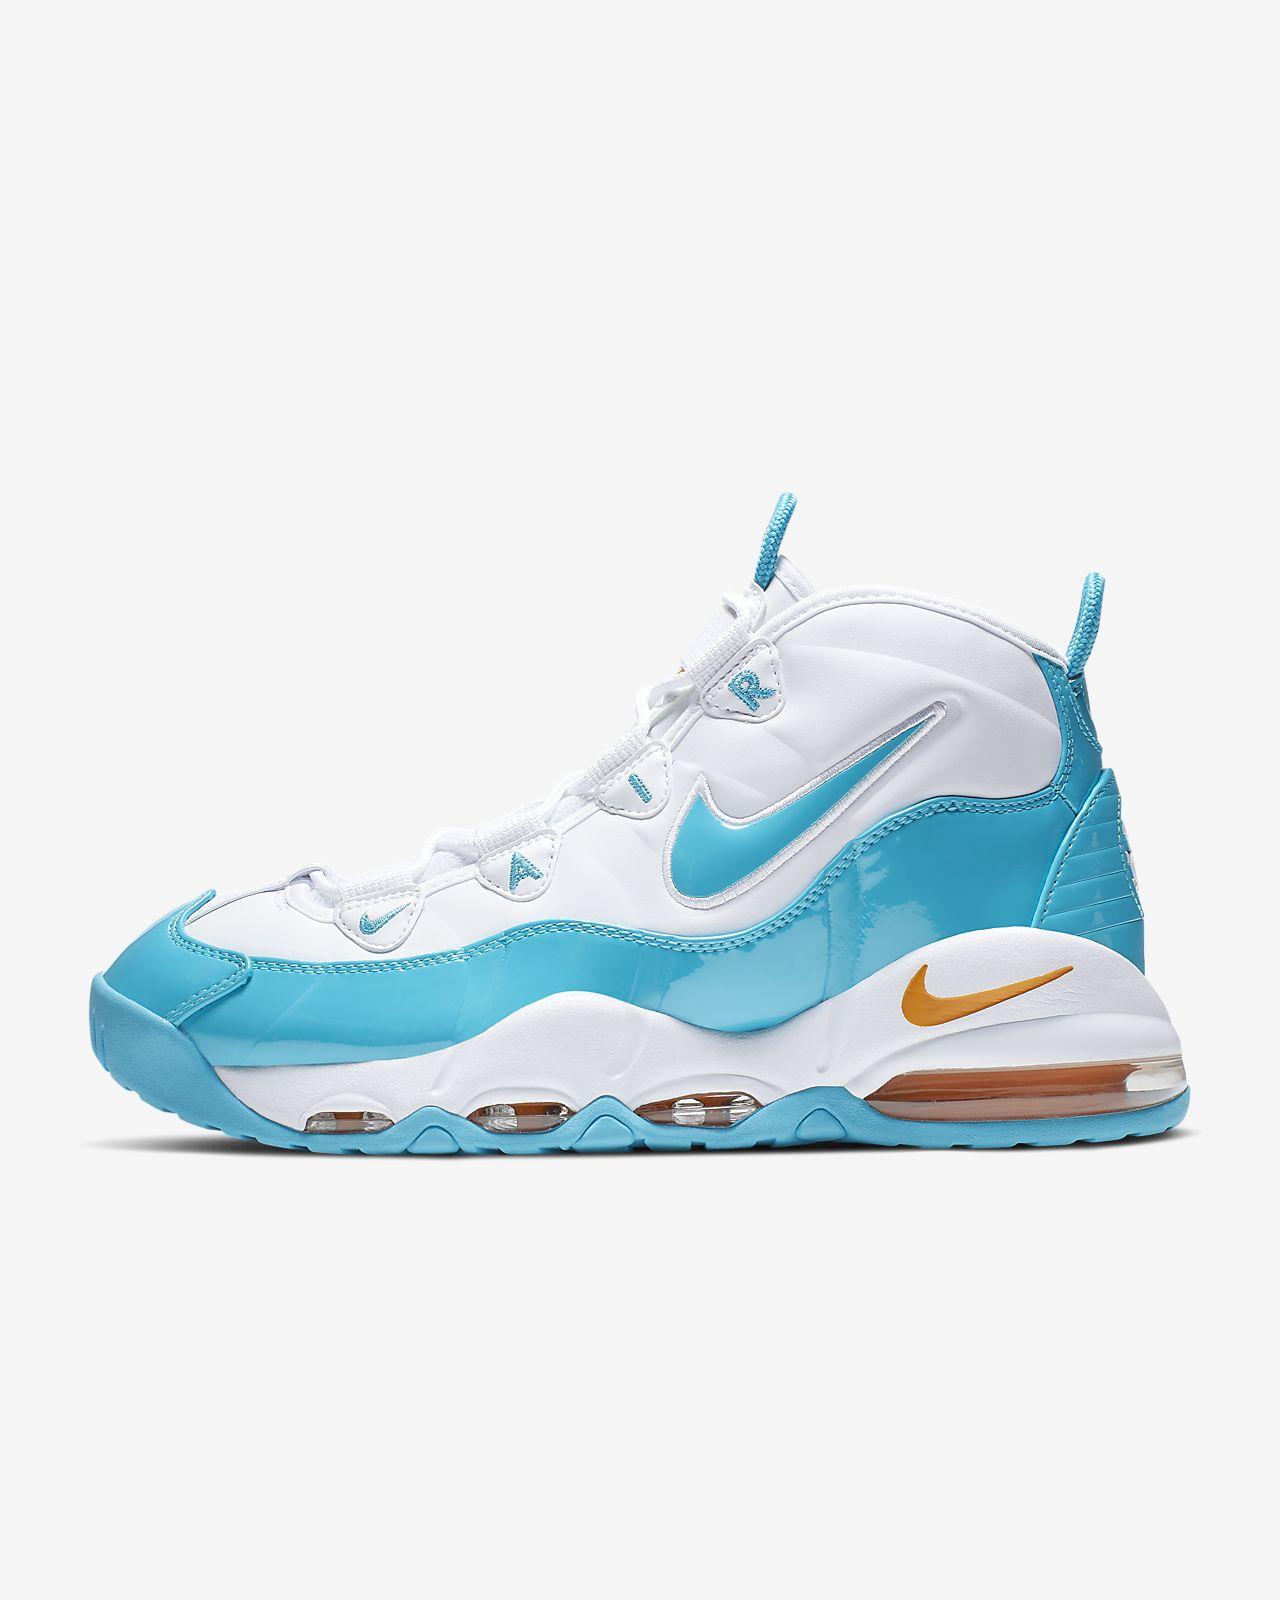 Calzado para hombre Nike Air Max Uptempo '95